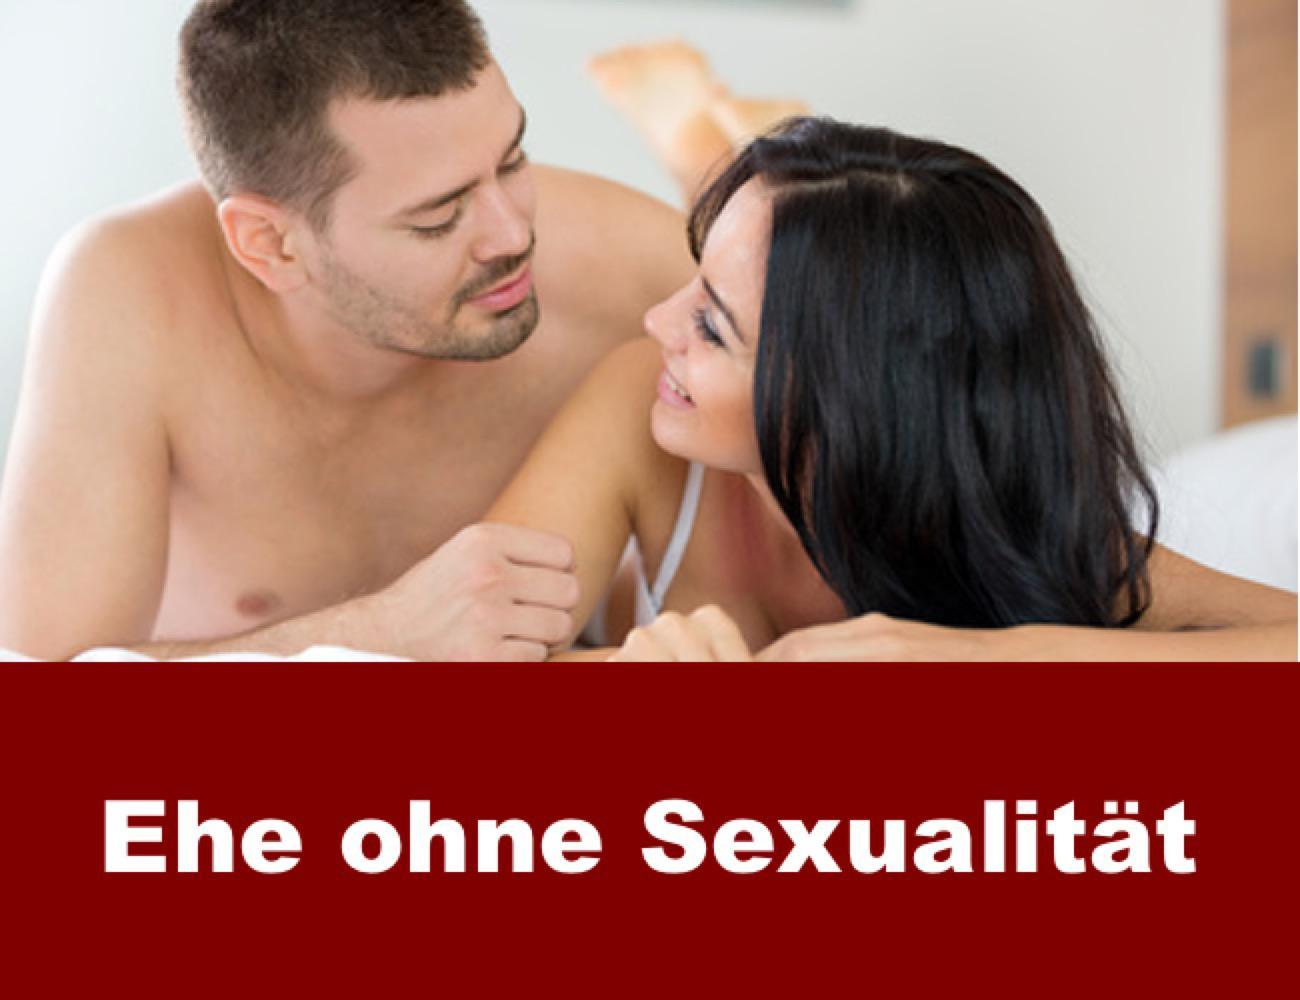 Ehe ohne Sexualität